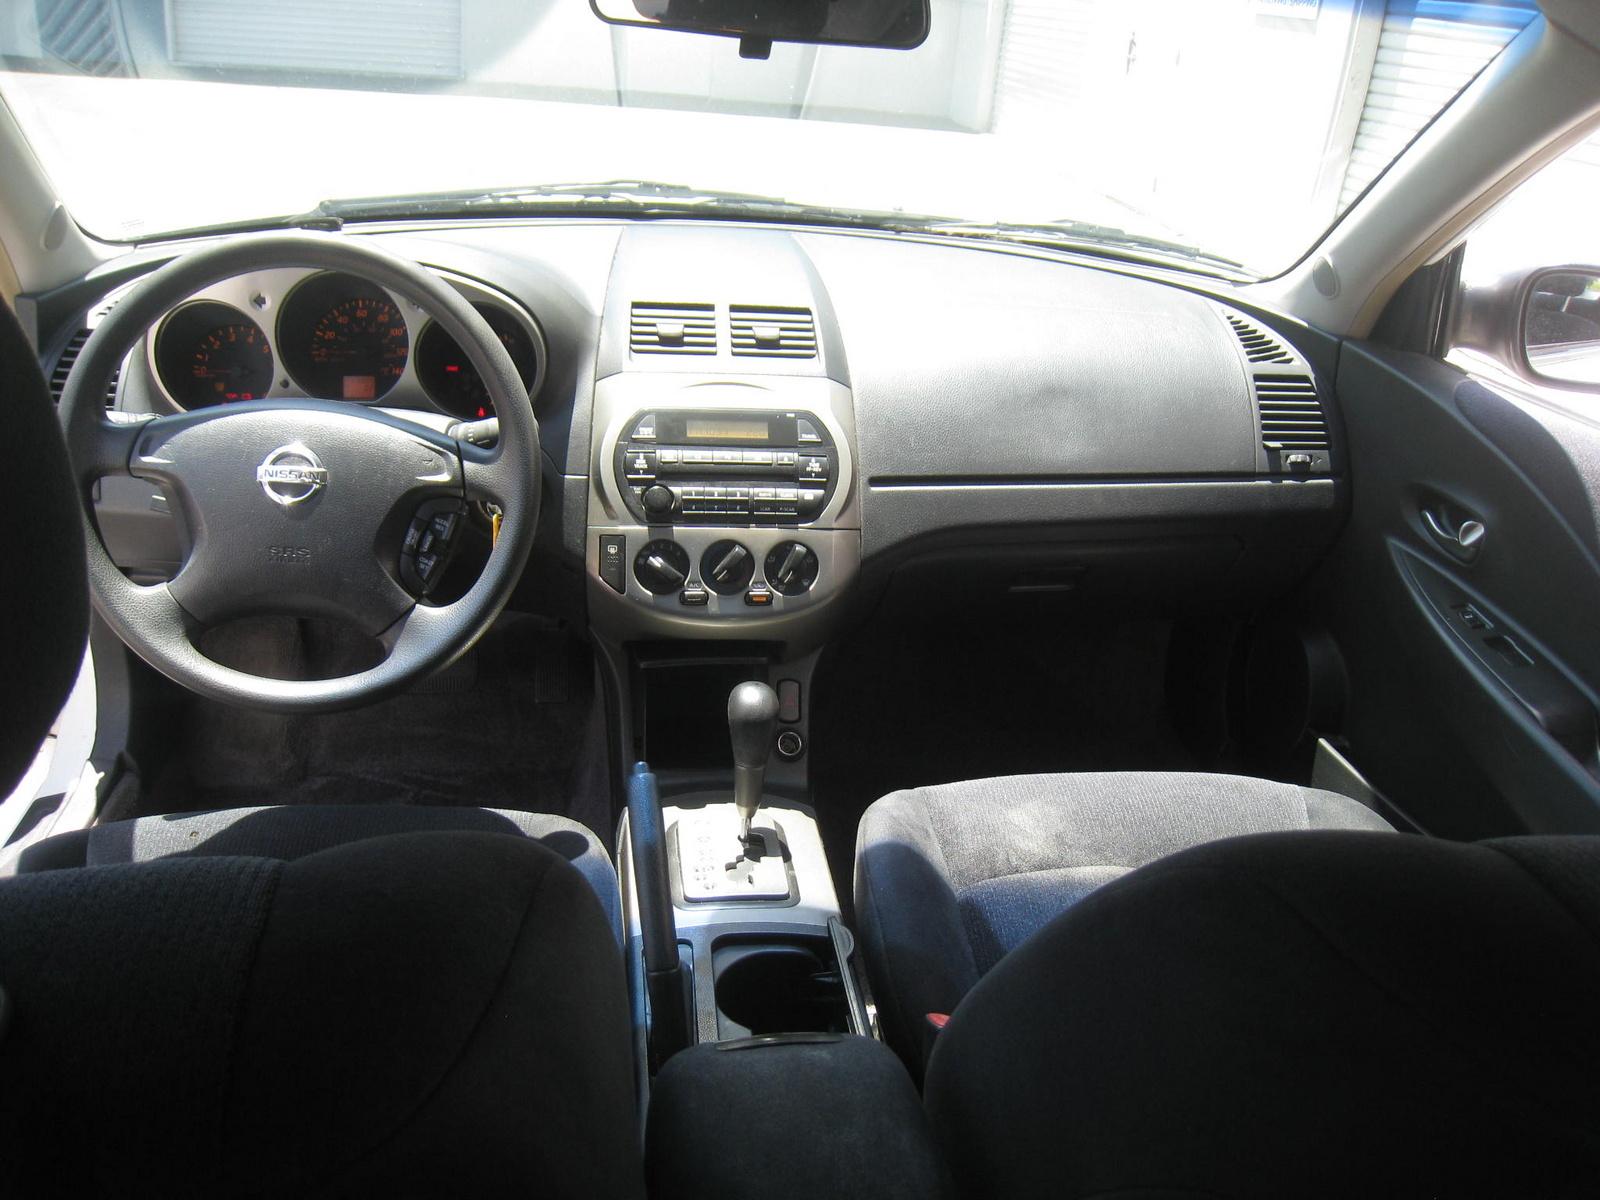 2007 Nissan Altima 2 5 S 2009 Nissan Altima 3 5 Sl Nissan Colors Bestand 2007 Nissan Altima Jpg